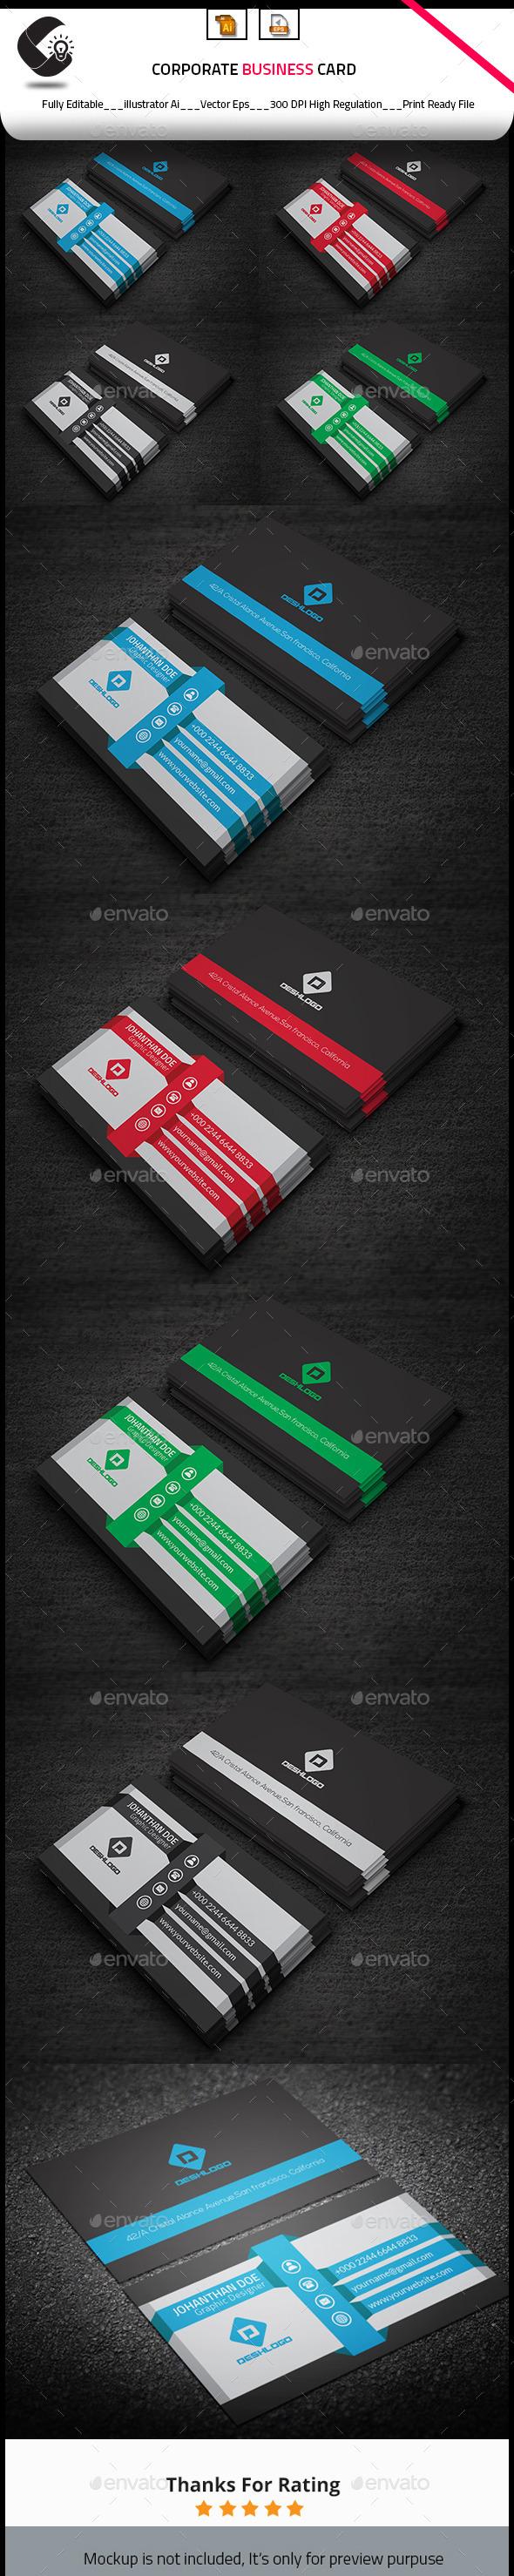 RENDO & Creative Business Card